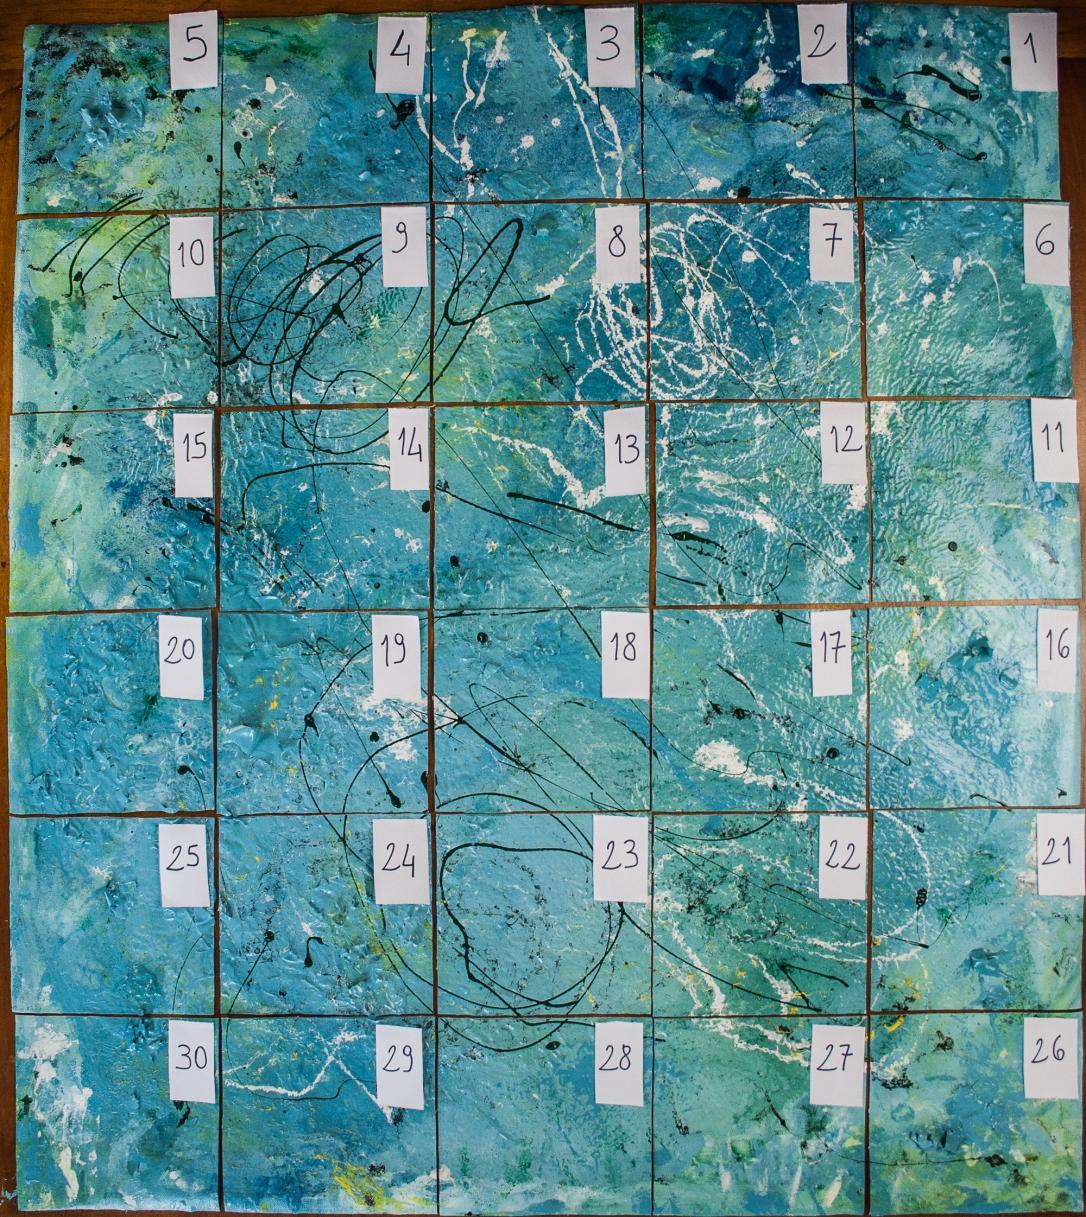 pieces paintintg grid